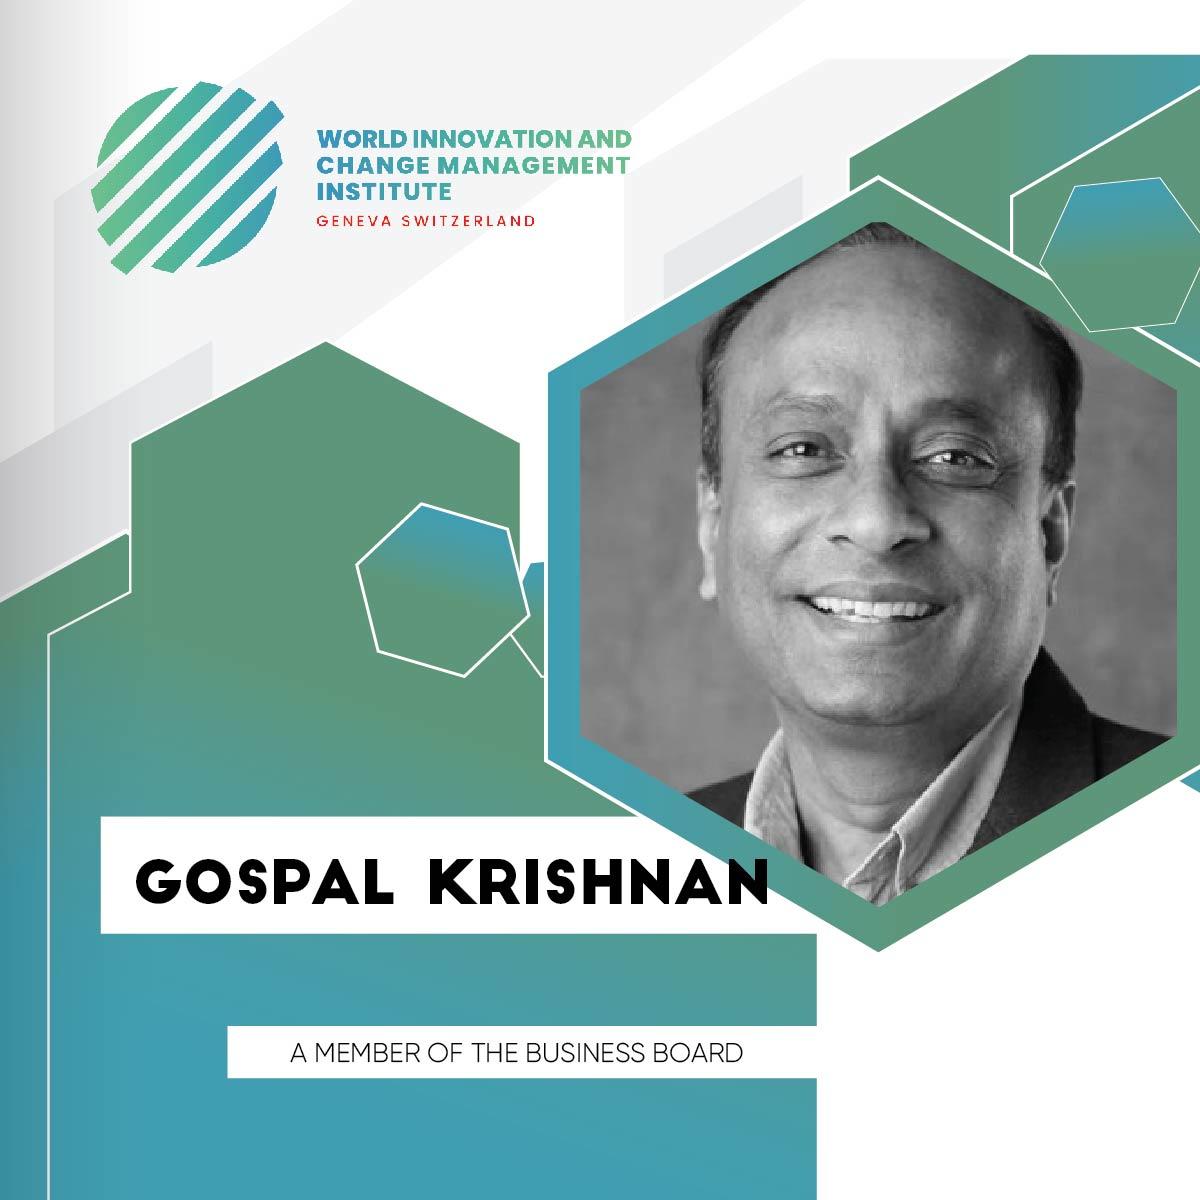 Gospal Krishnan